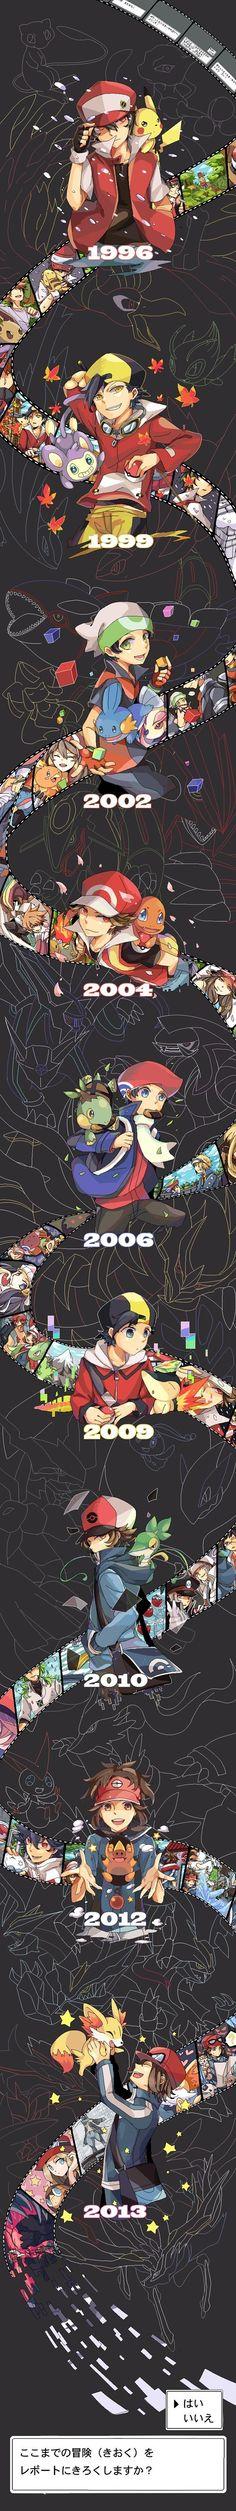 Pokémon - Pokémon, from the beginning until now.